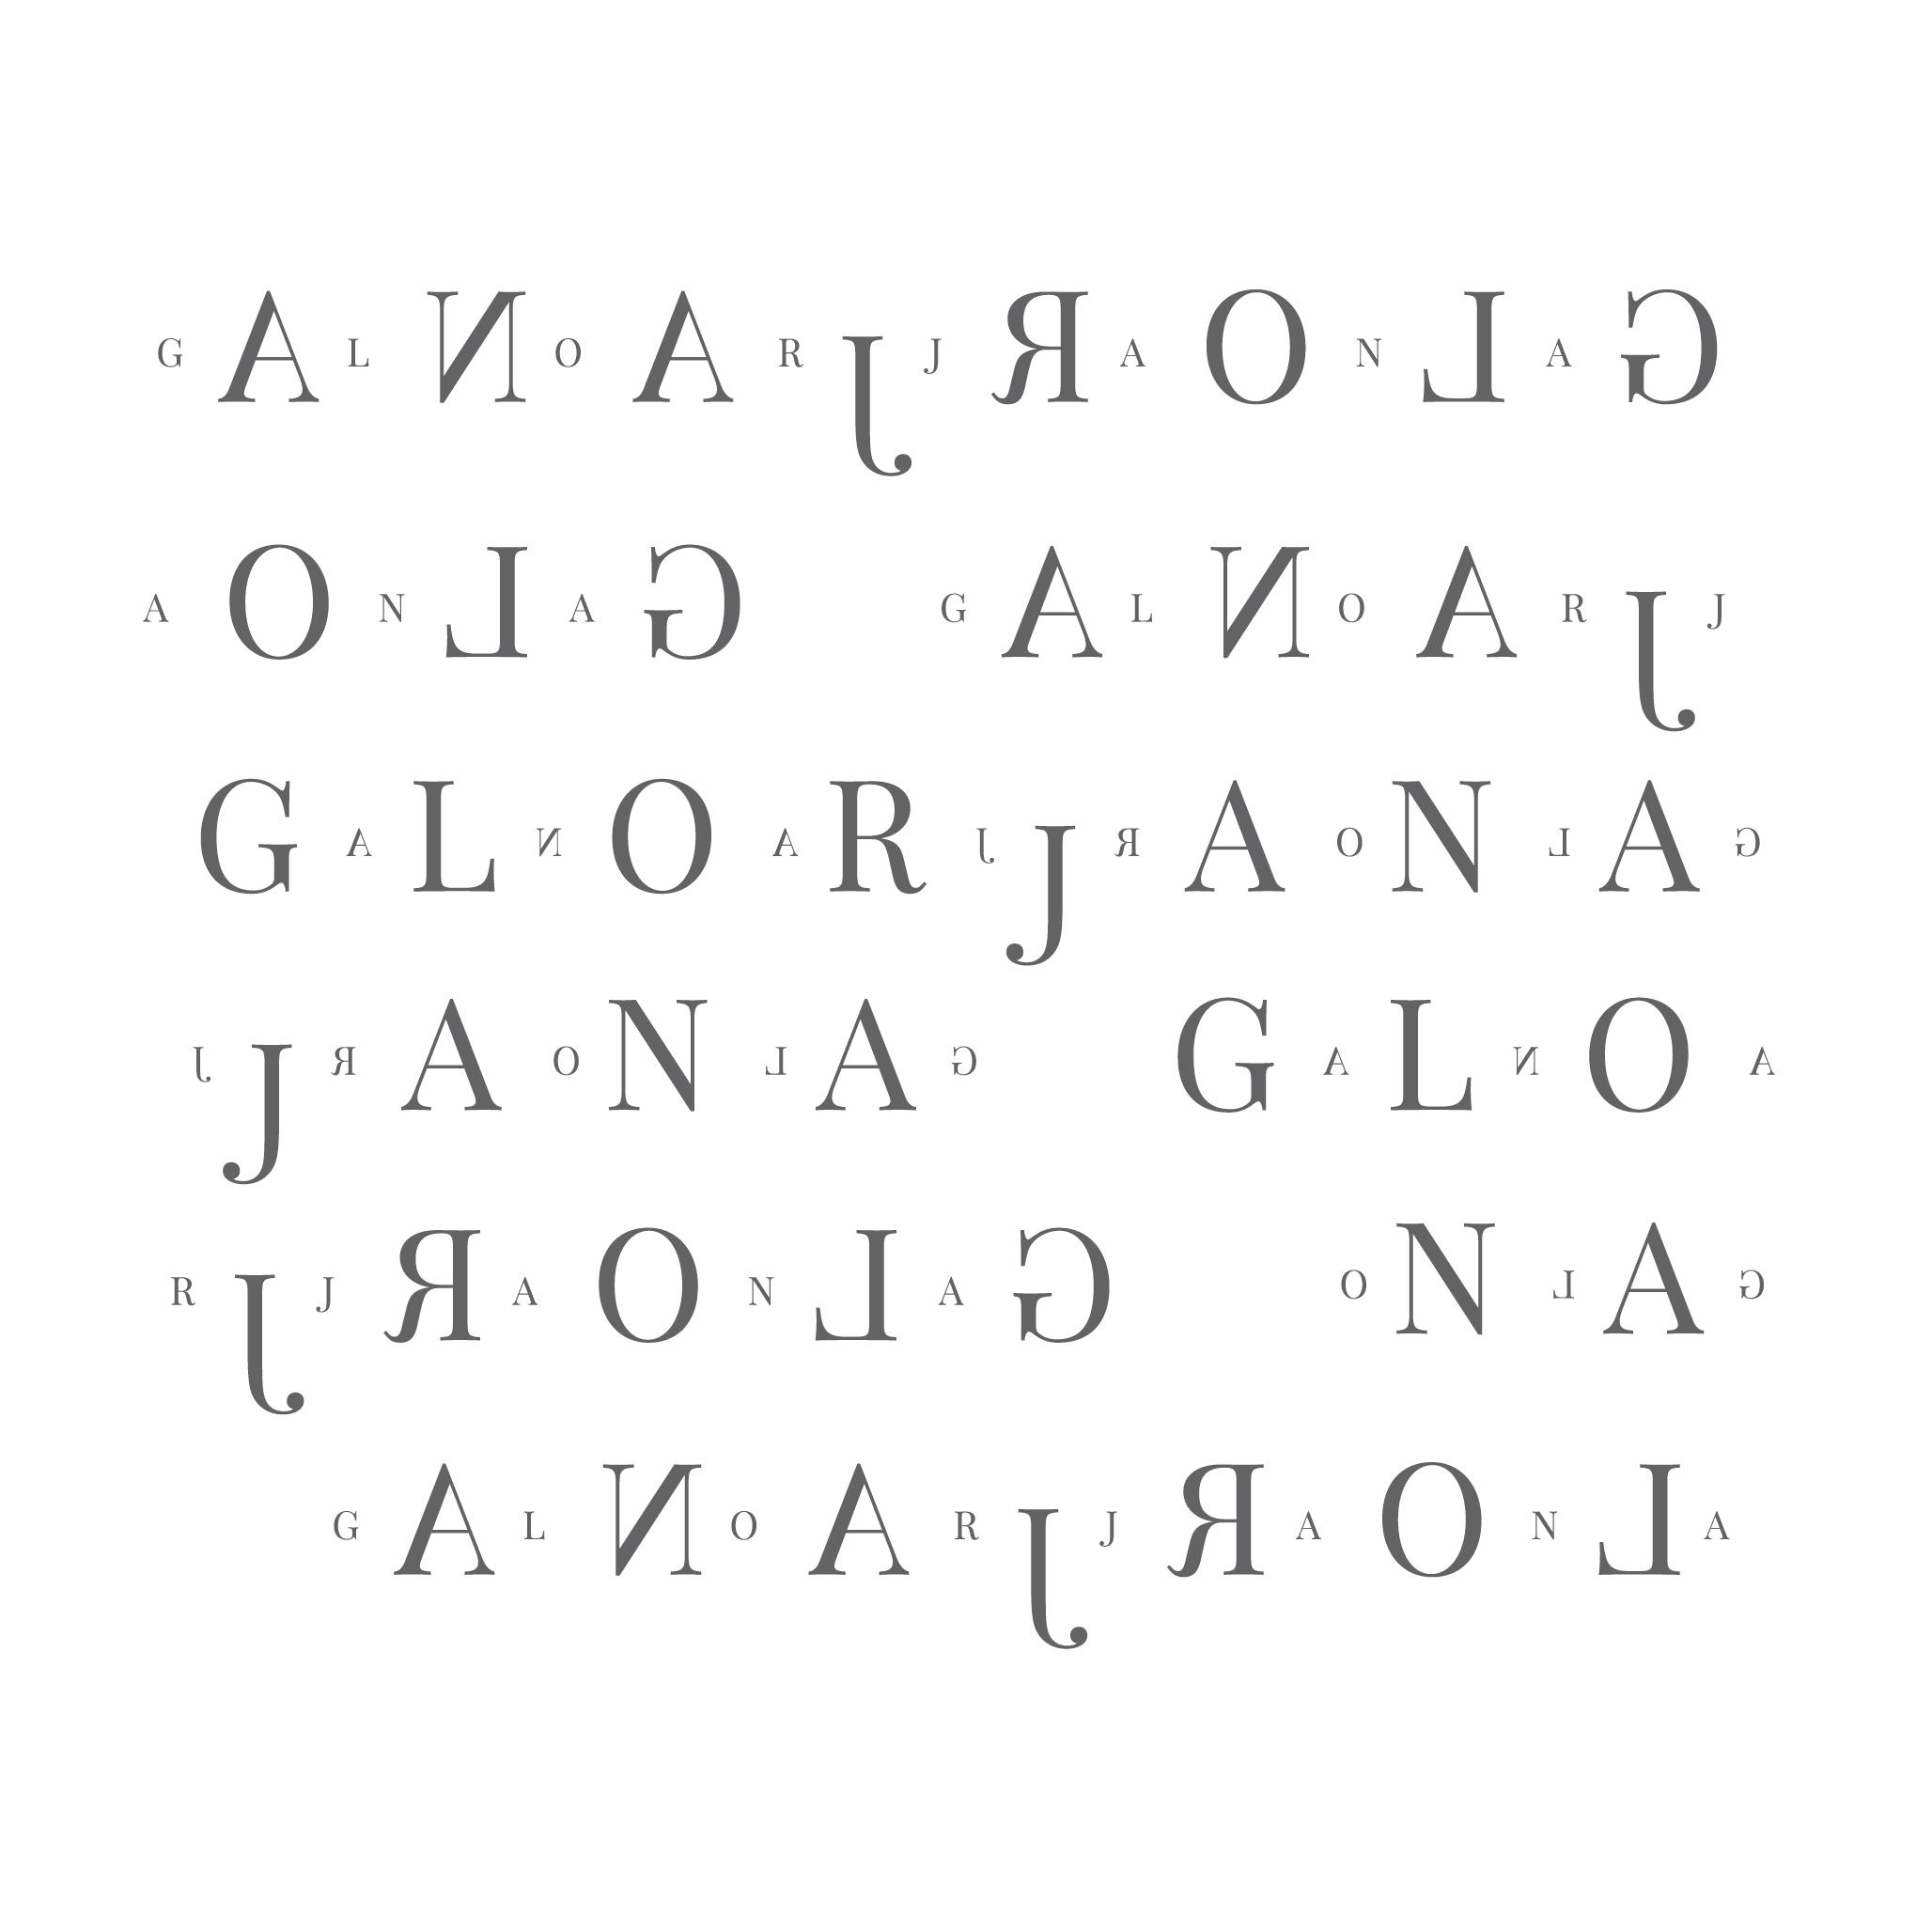 Glorjana-ProfilneGreyORG-12